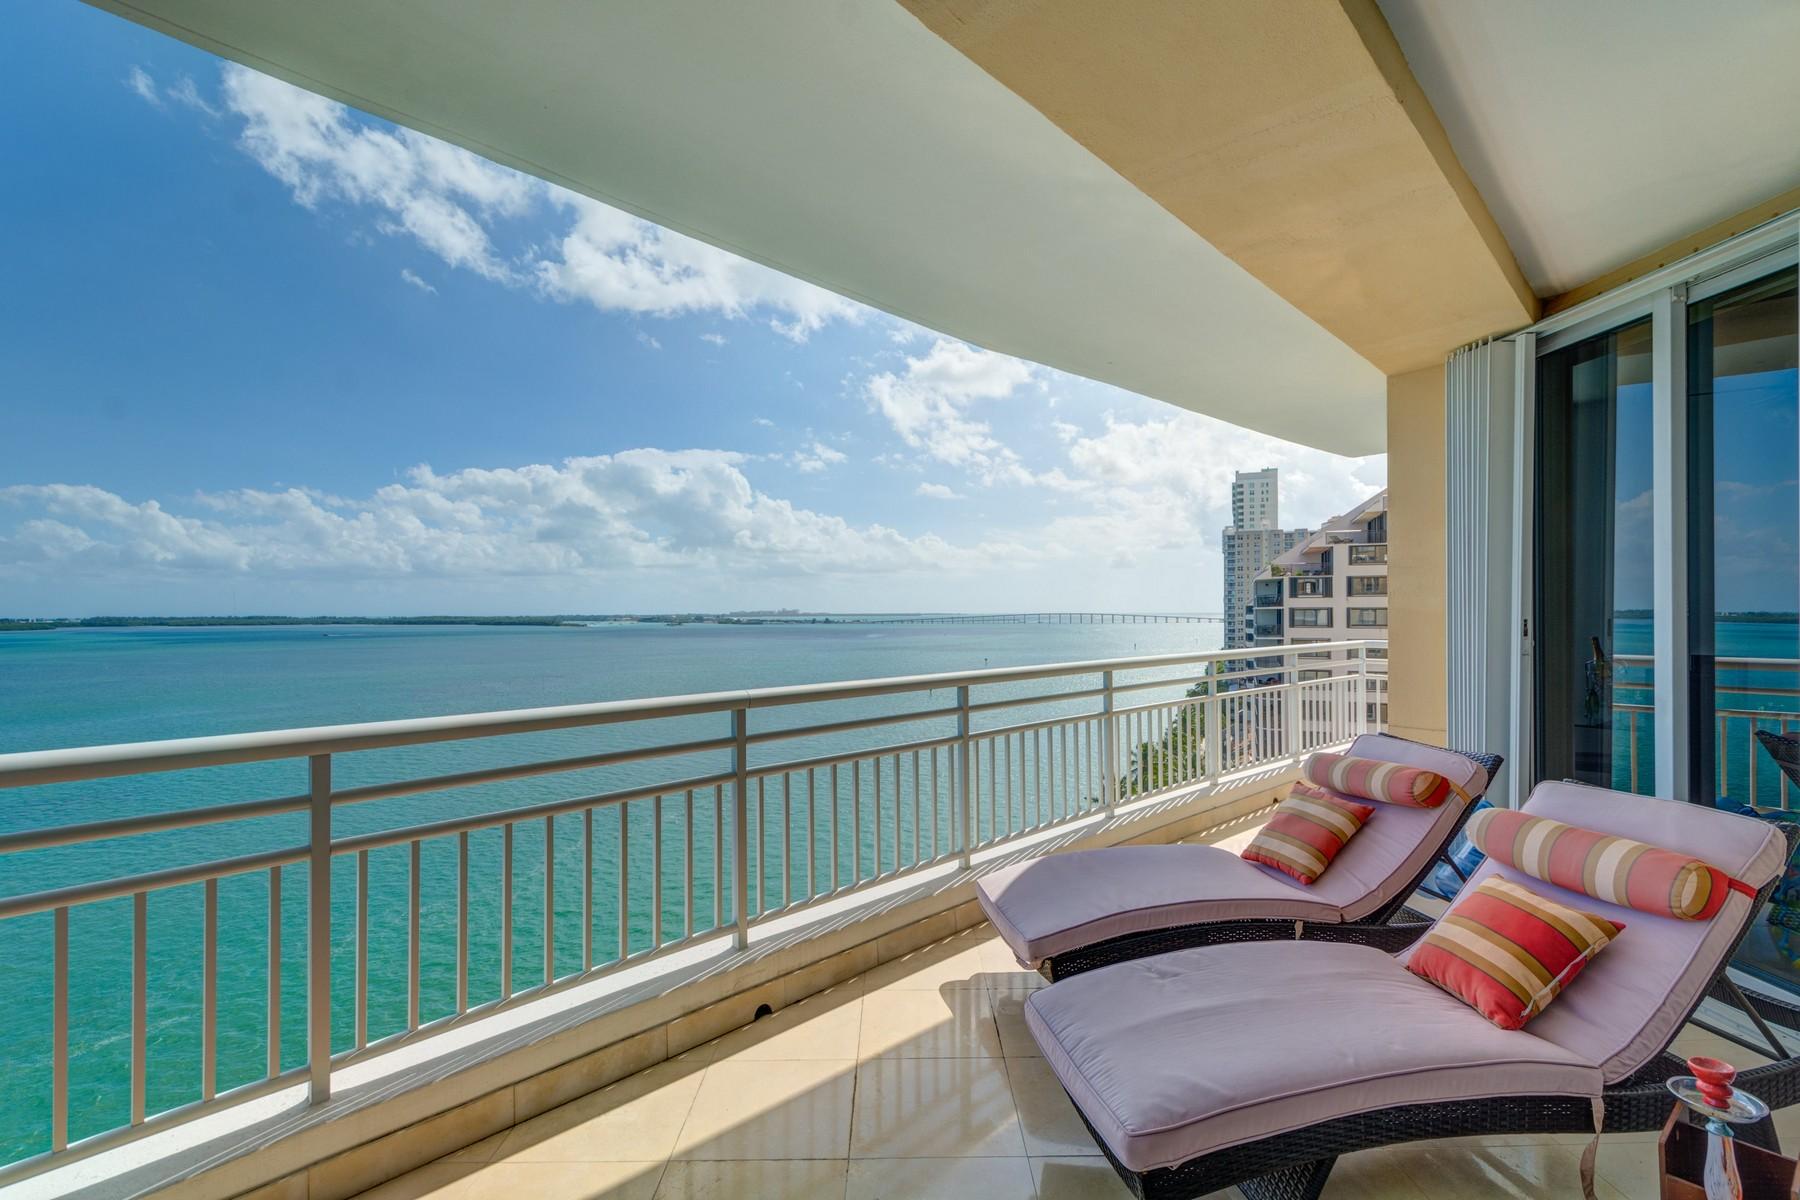 Condominium for Sale at 808 Brickell Key Dr #1104 Miami, Florida 33131 United States